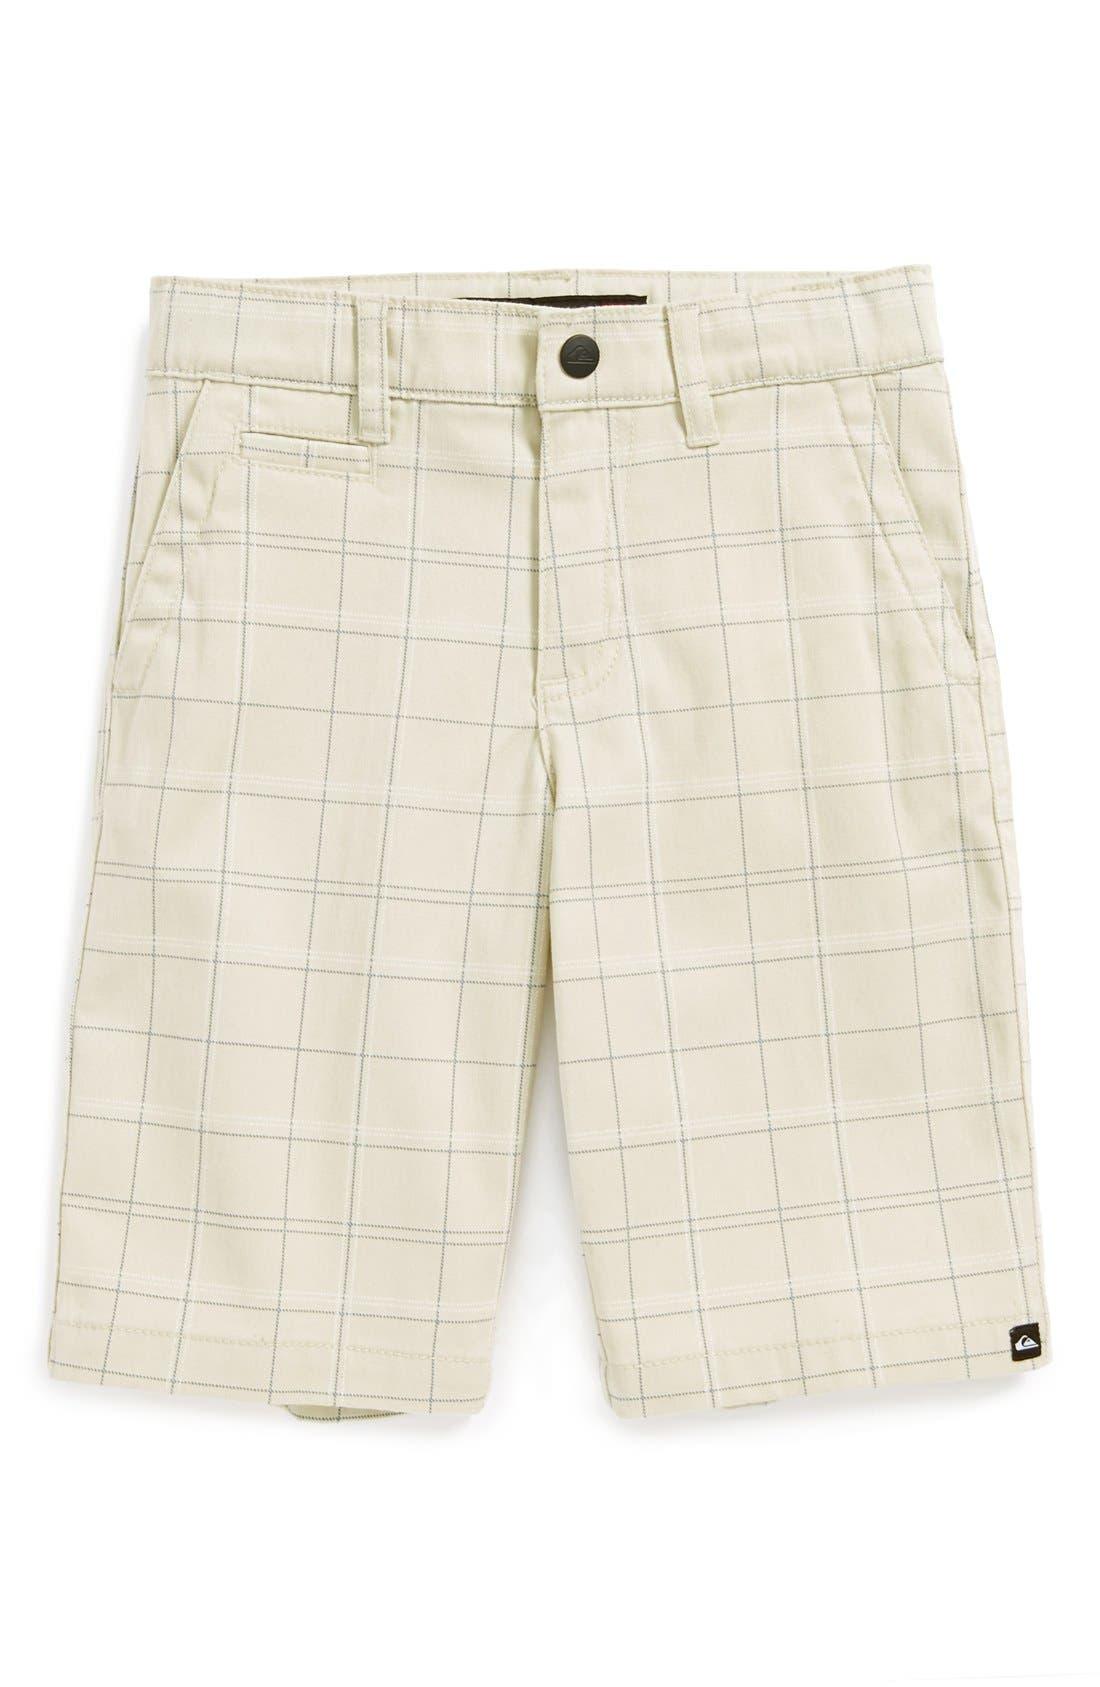 Main Image - Quiksilver 'Divided Surplus' Shorts (Big Boys)